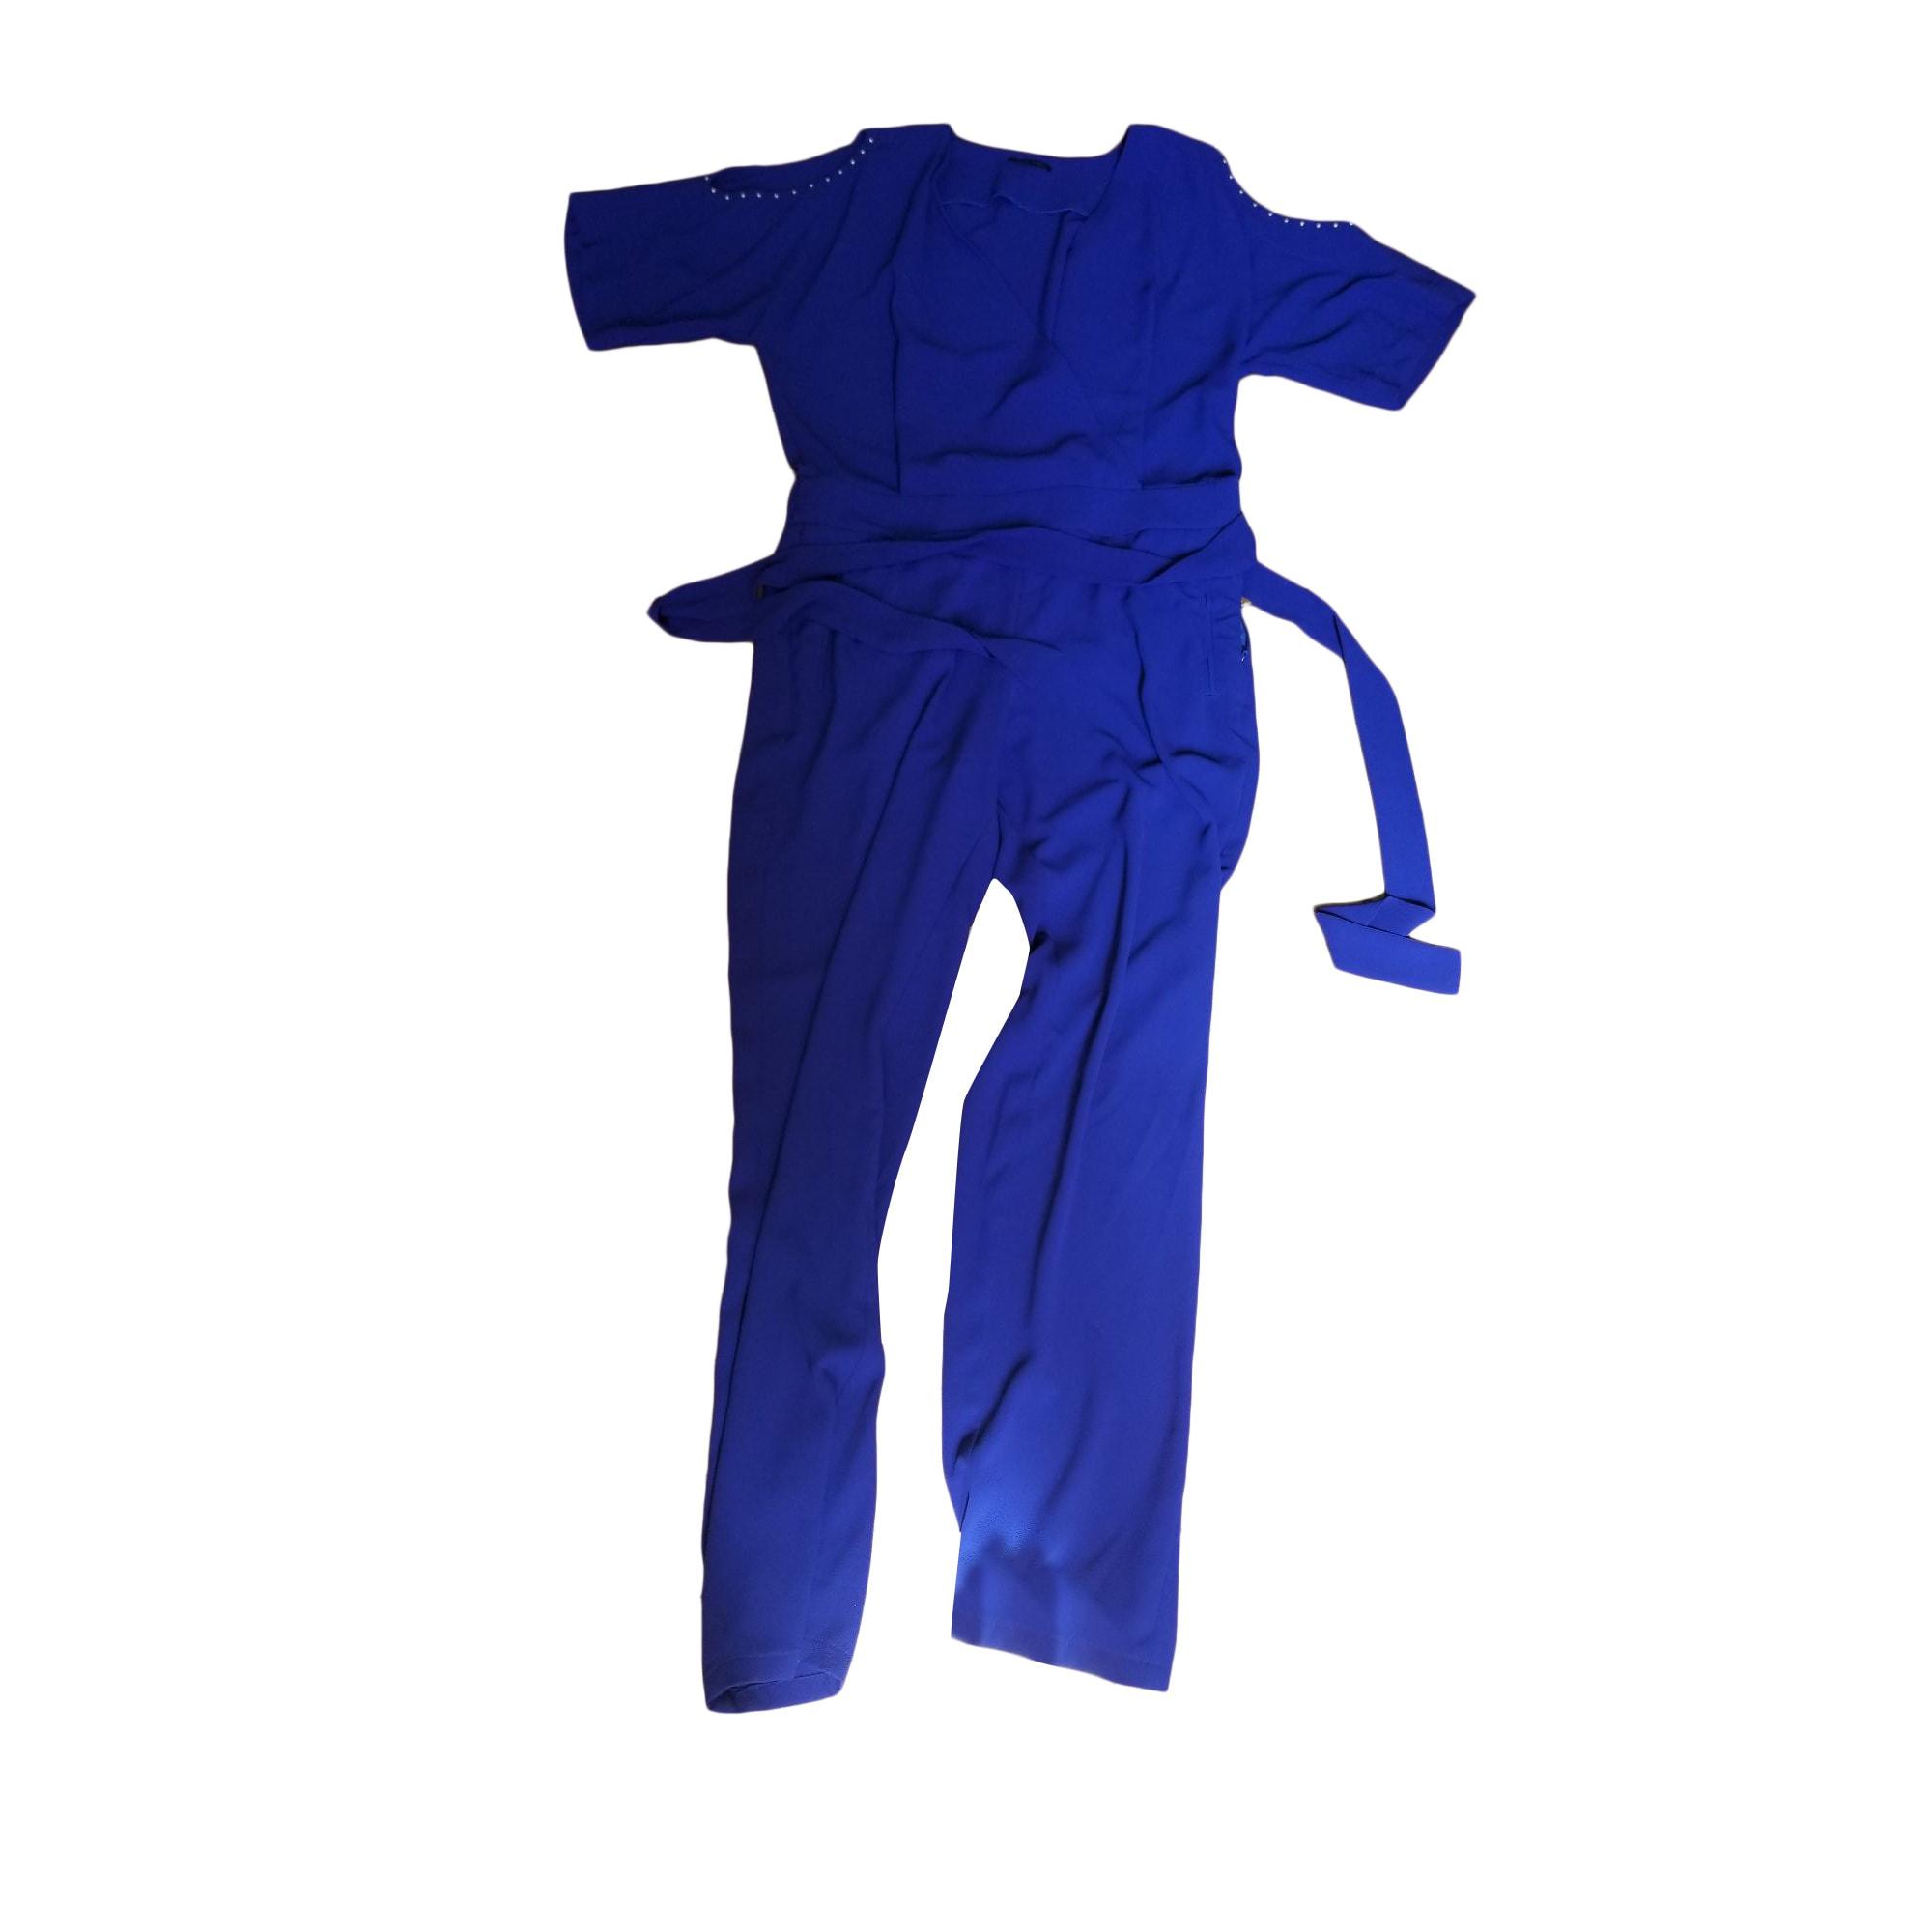 Combinaison IKKS Bleu, bleu marine, bleu turquoise